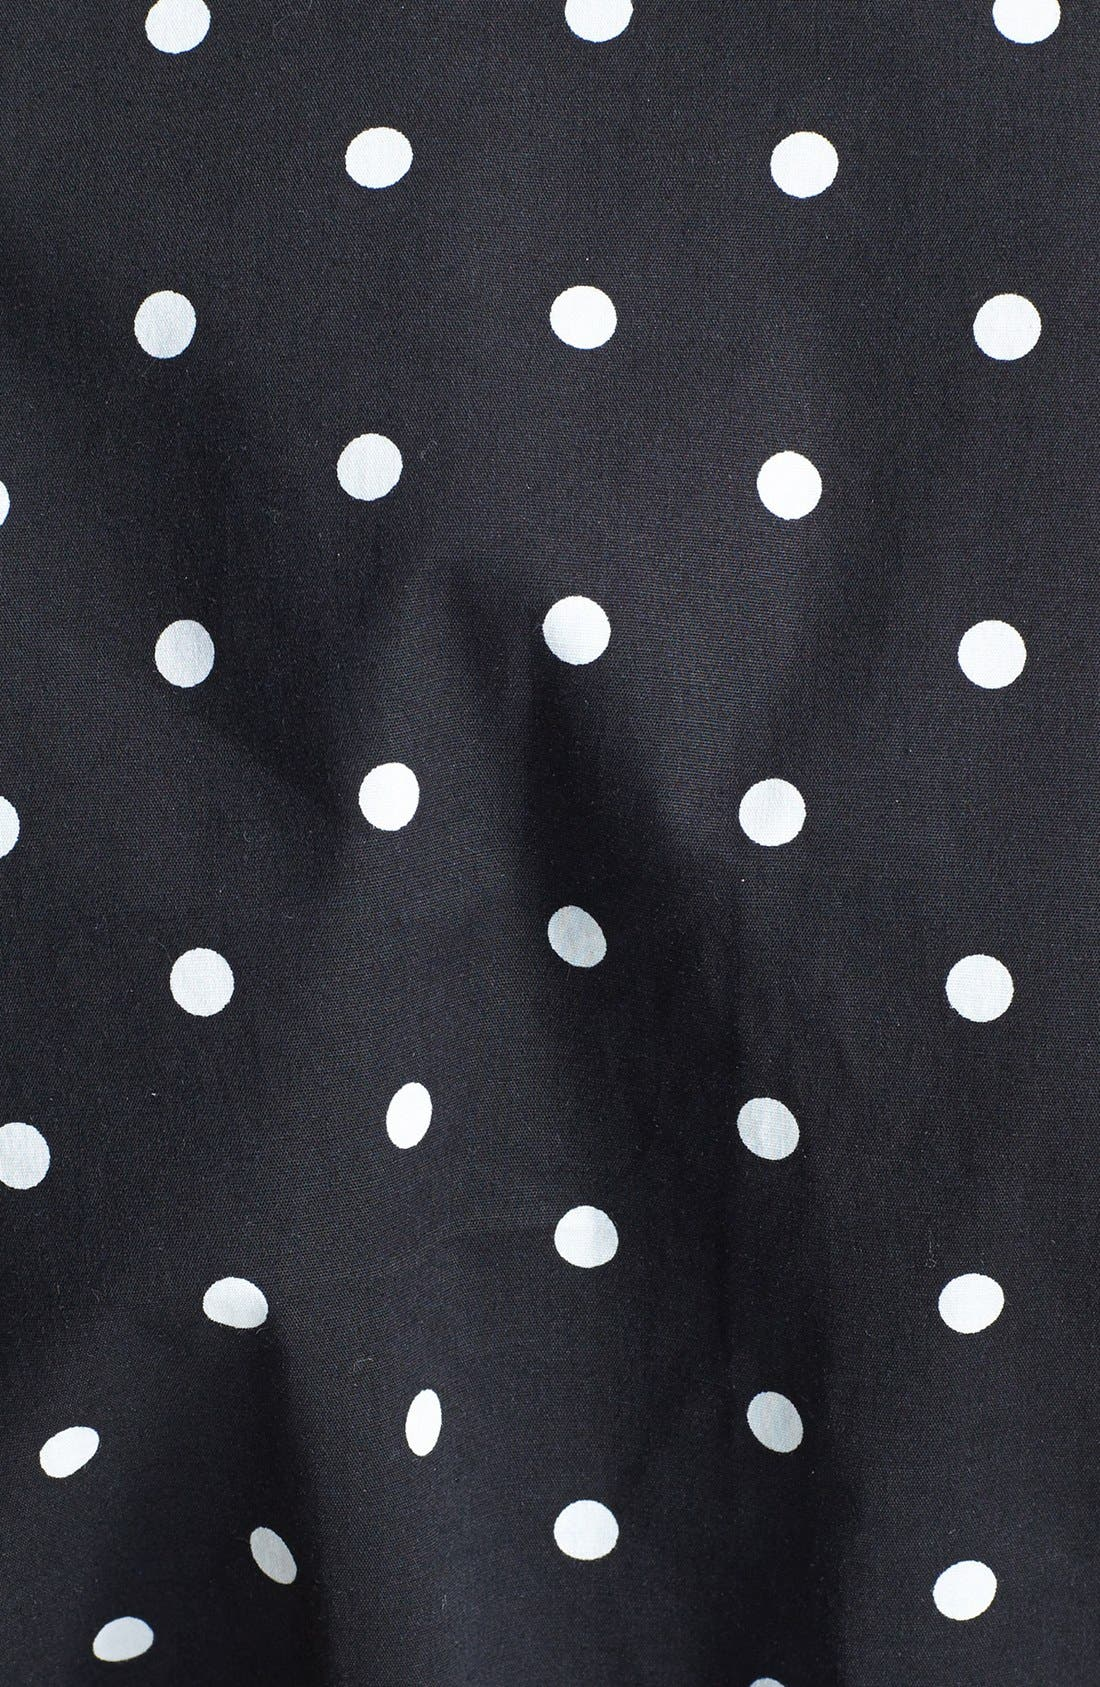 Alternate Image 3  - City Chic Polka Dot Cotton Sateen Fit & Flare Dress (Plus Size)